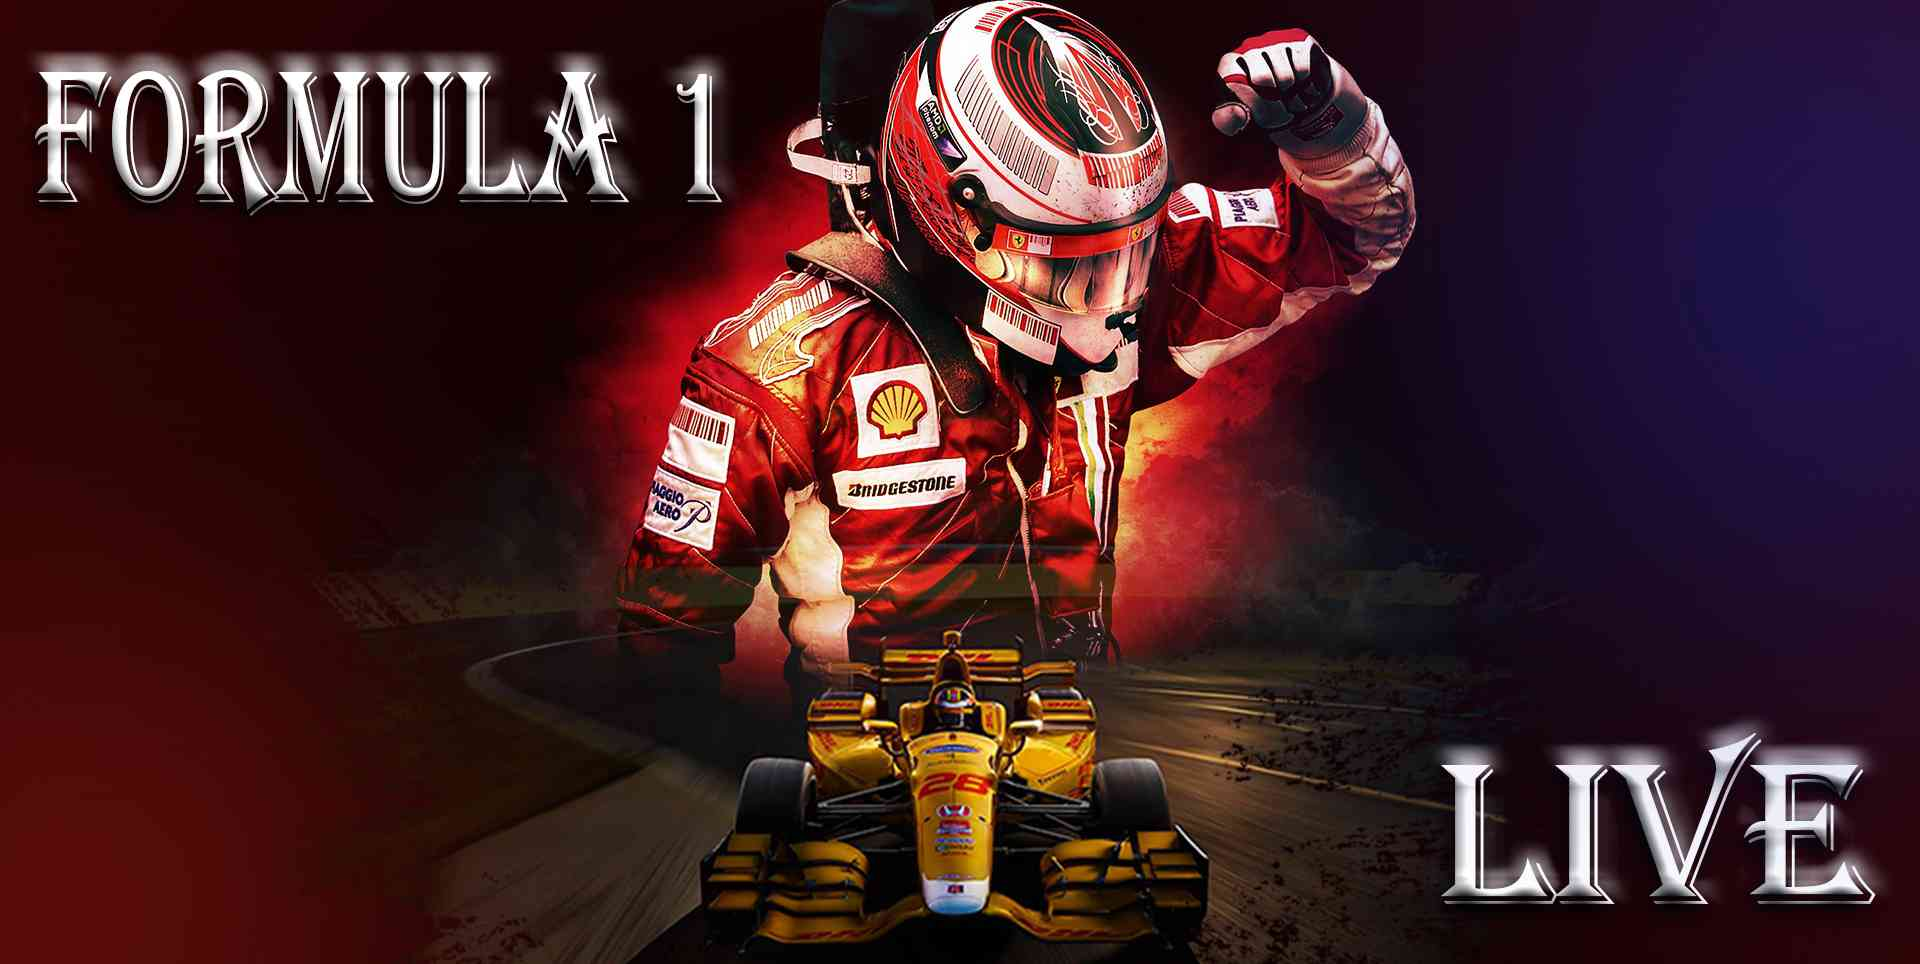 brands-hatch-gp-brdc-formula-3-race-online